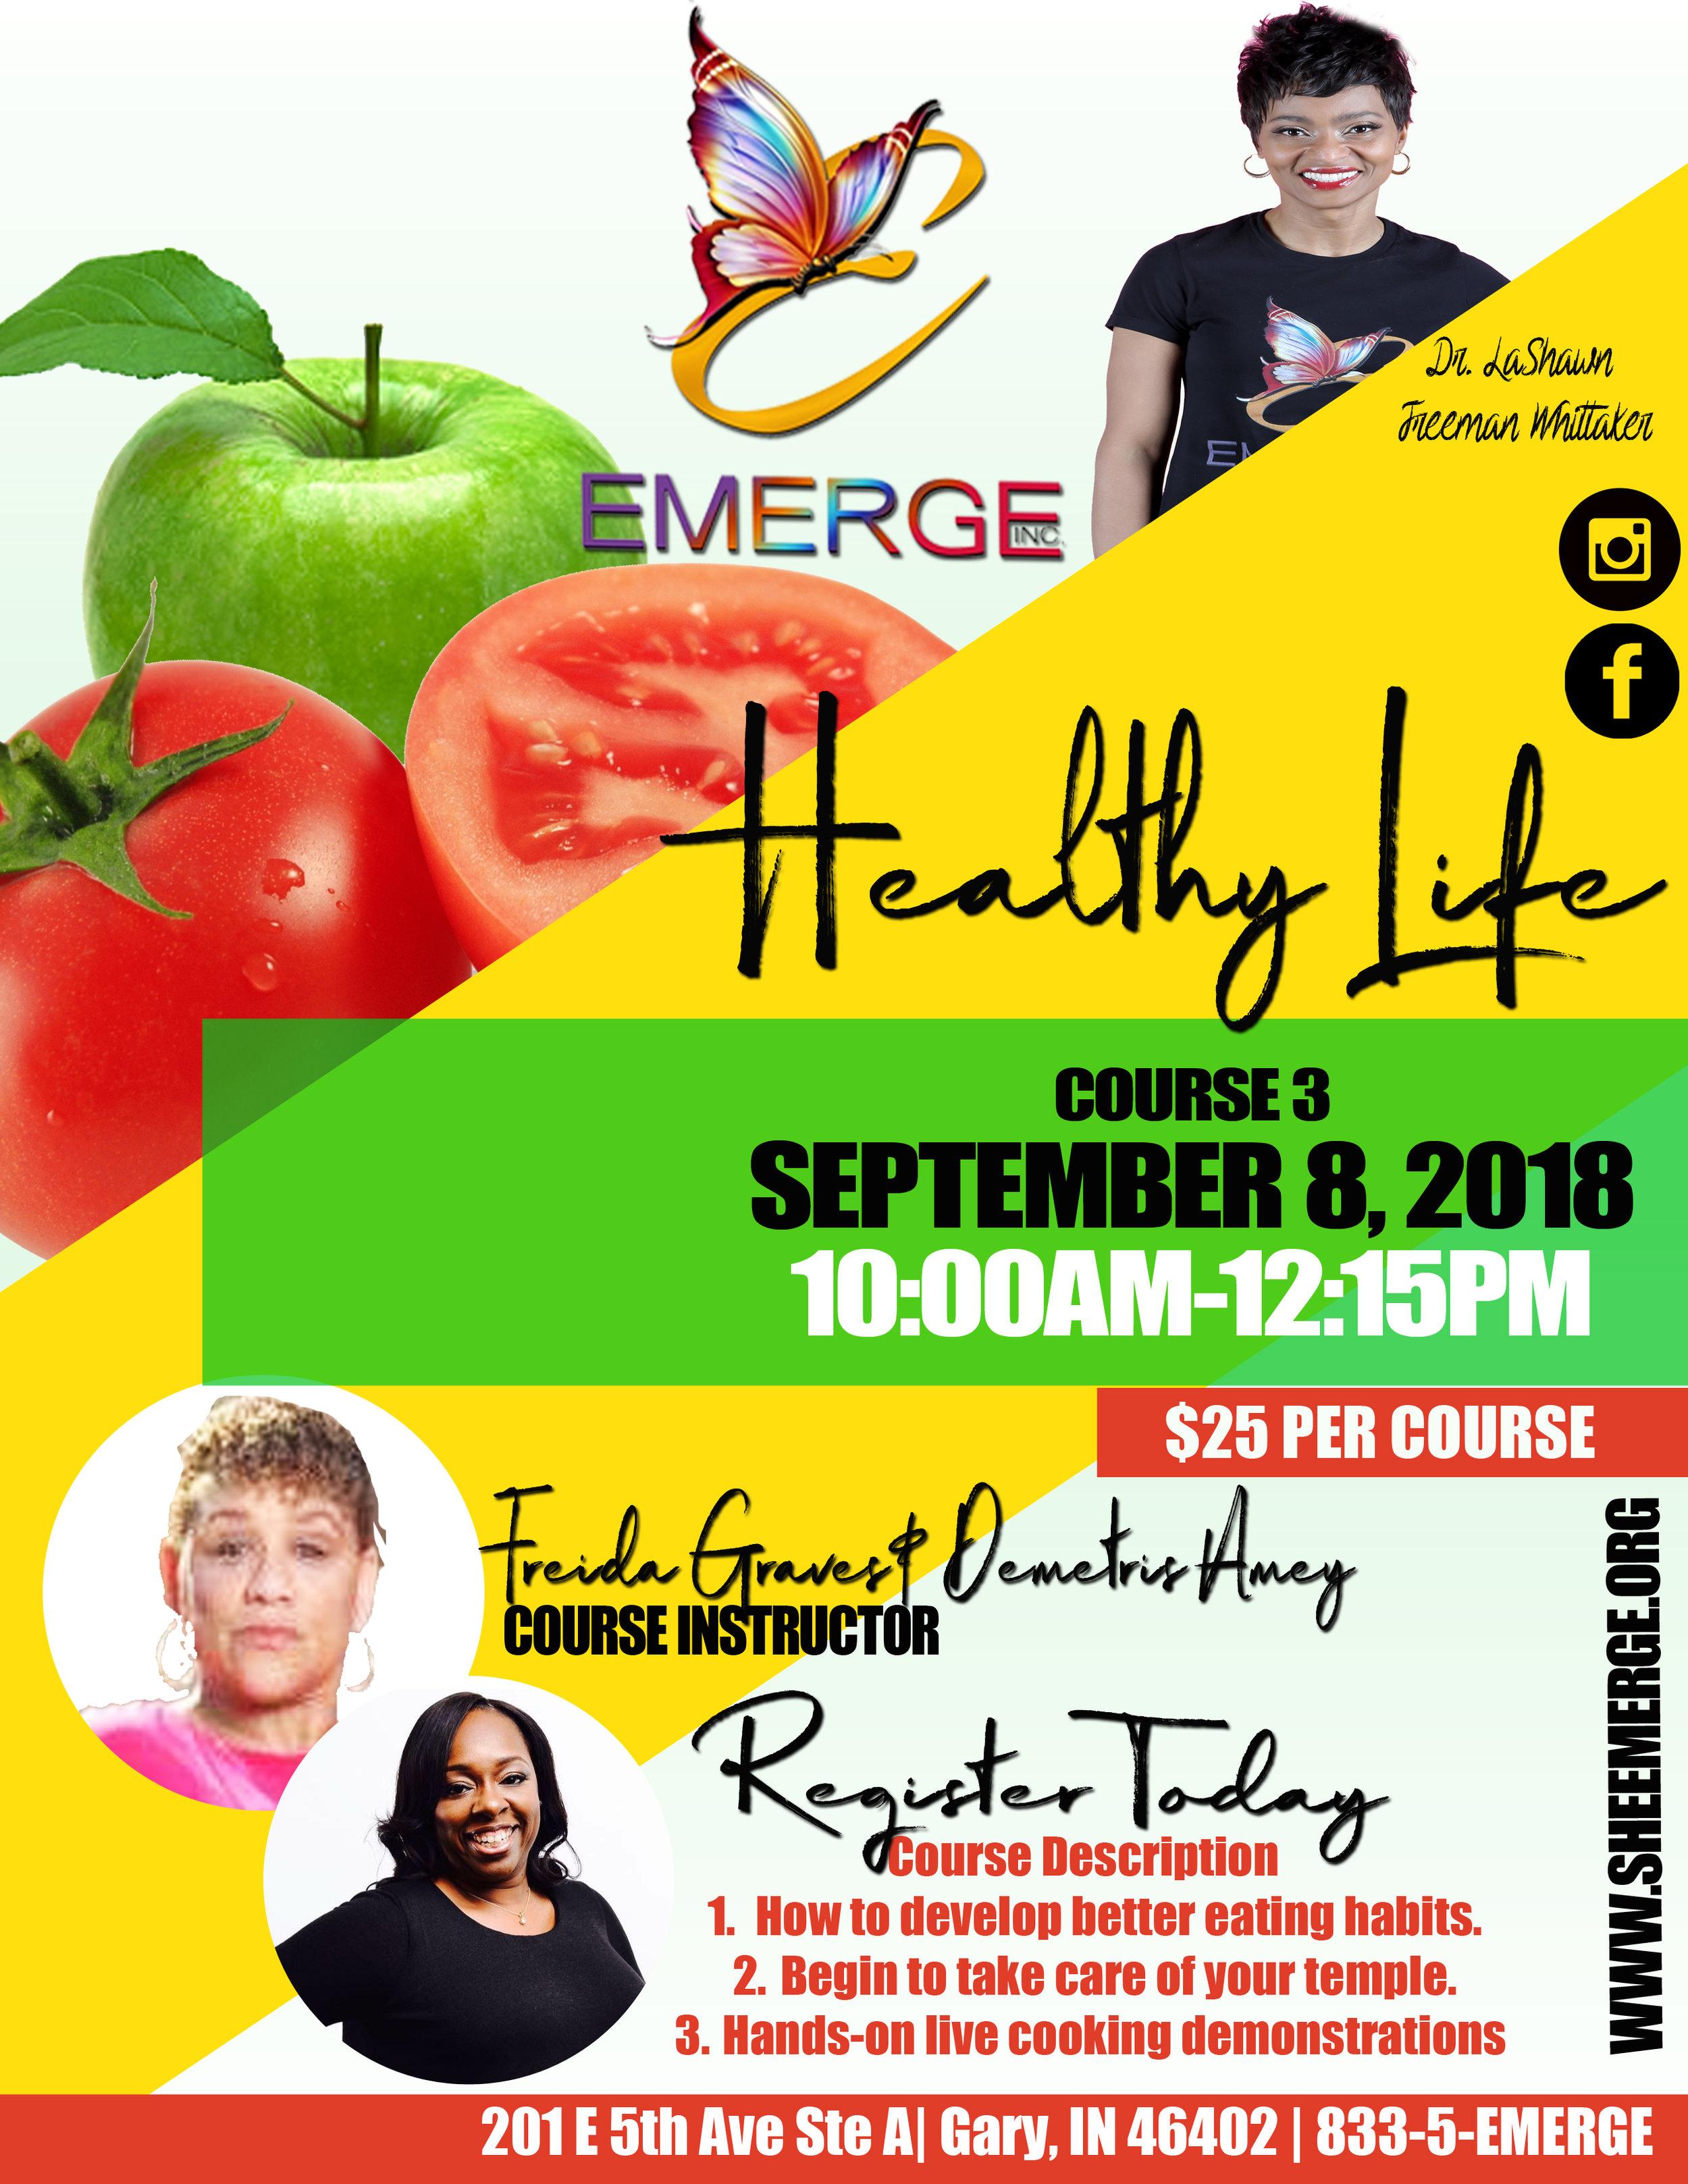 Course 3: A Healthy Life 2 - Session Start Date: September 8, 2018Course Description: Good Habits, Bad Food, ExercisePresenter: Freida Graves & Demetris AmeyTime: 10:00am-12:15pmLocation: 201 E 5th Ave Ste D